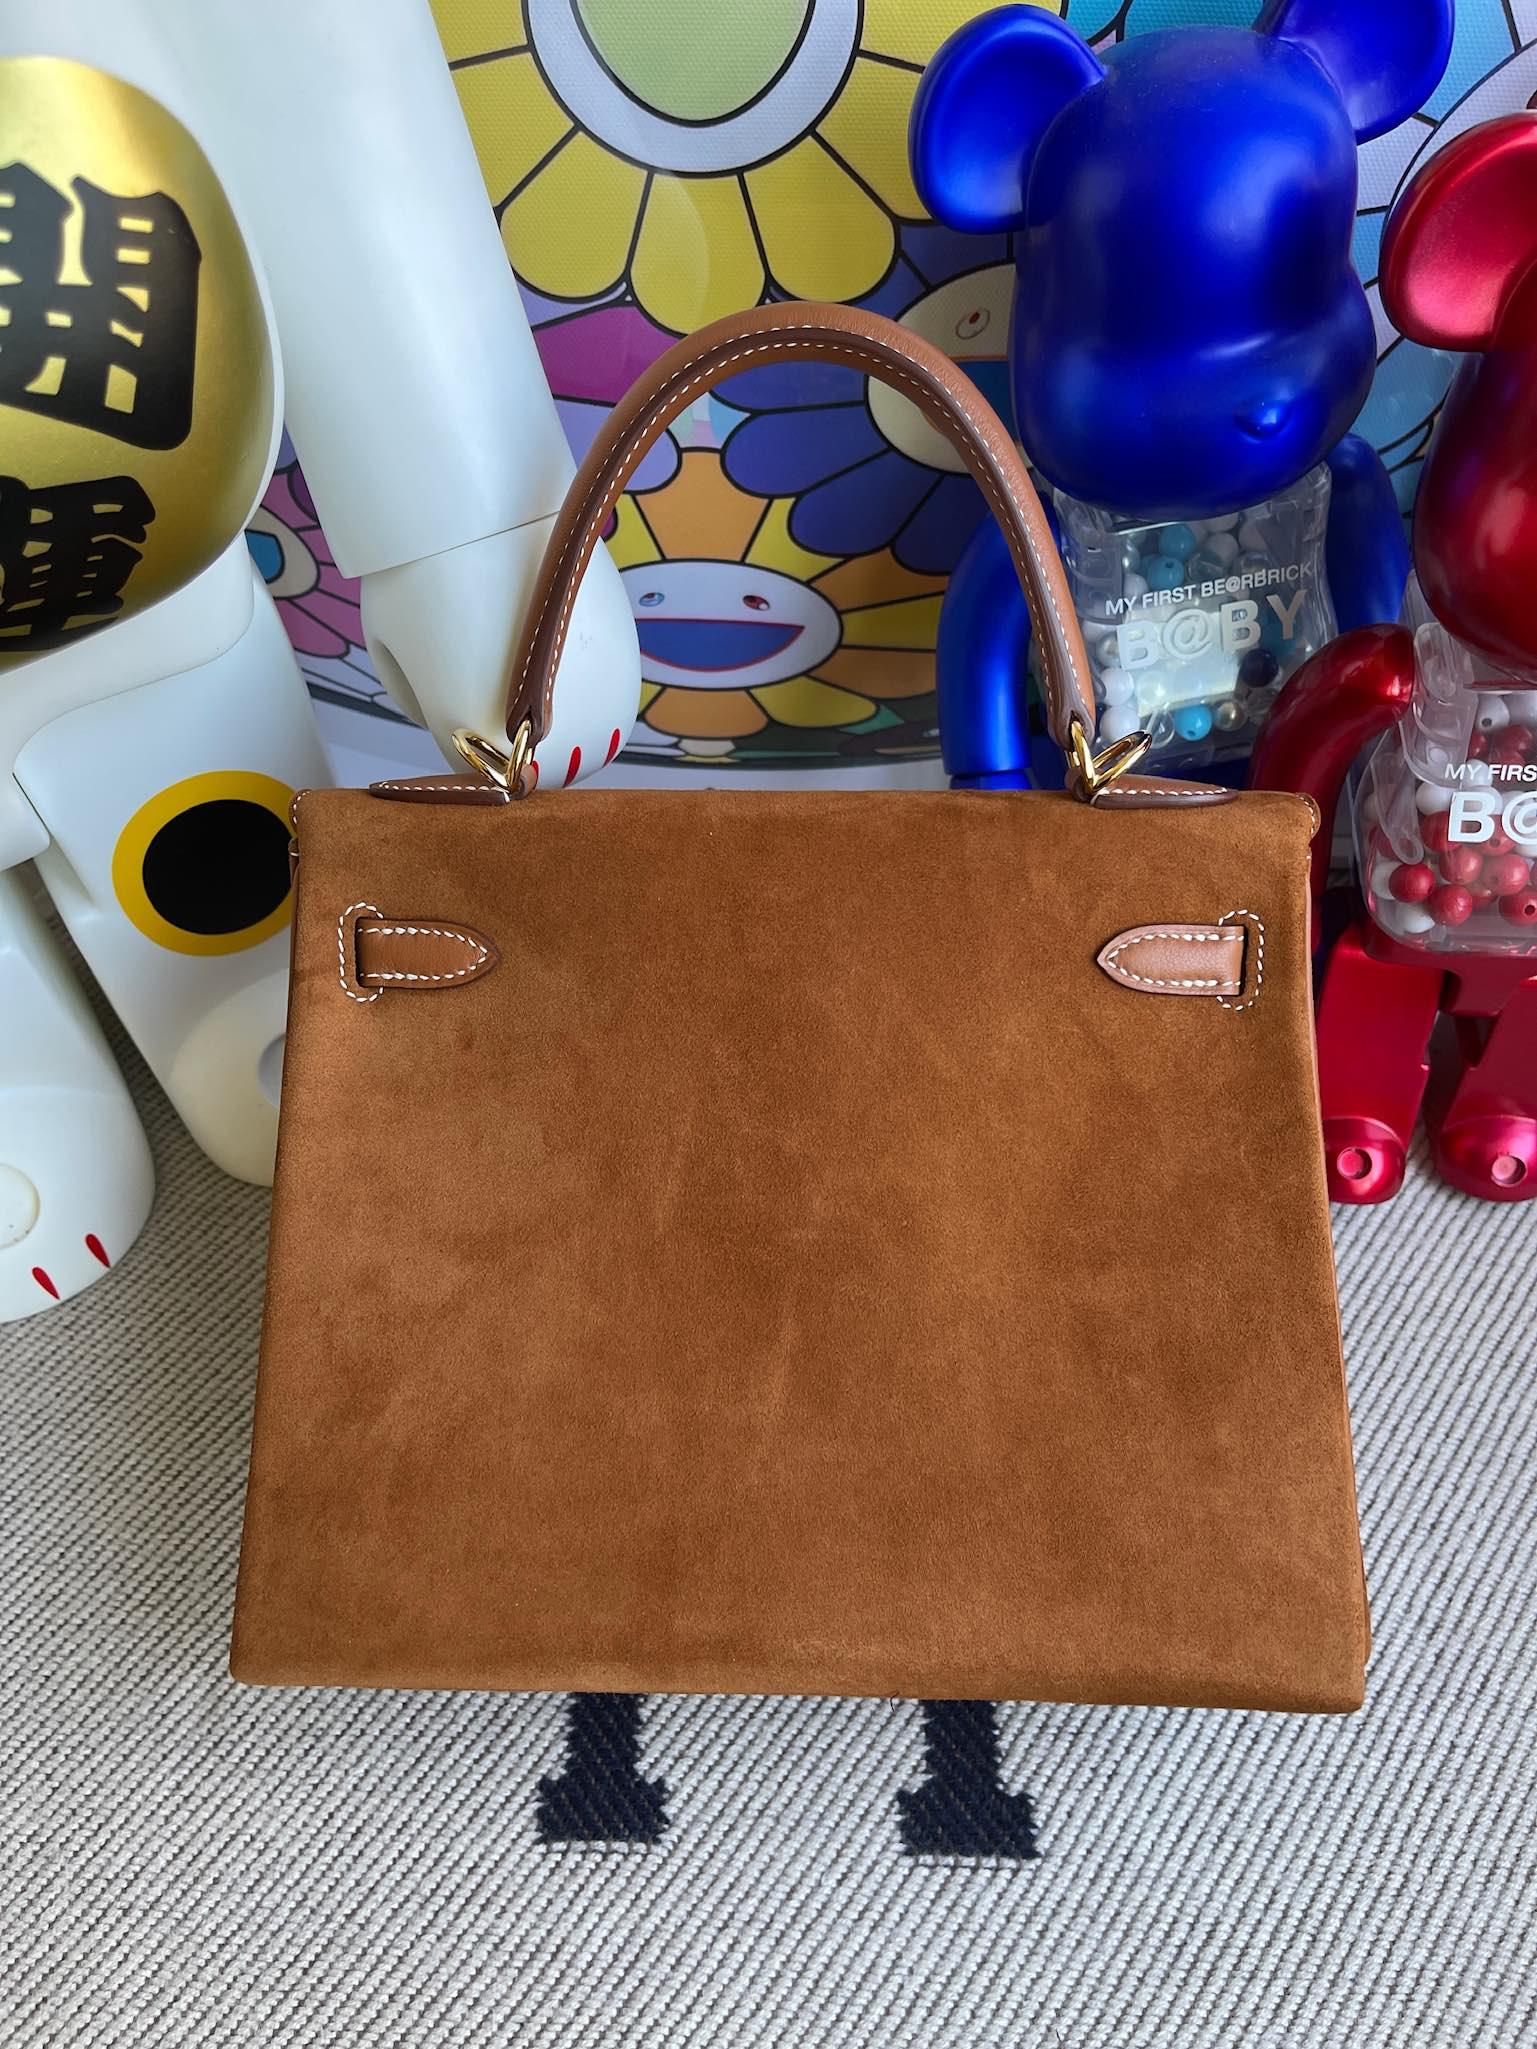 Hermès(爱马仕)Kelly 凯莉包 麂皮 拼 swift 金棕色 金扣 25cm 顶级手缝